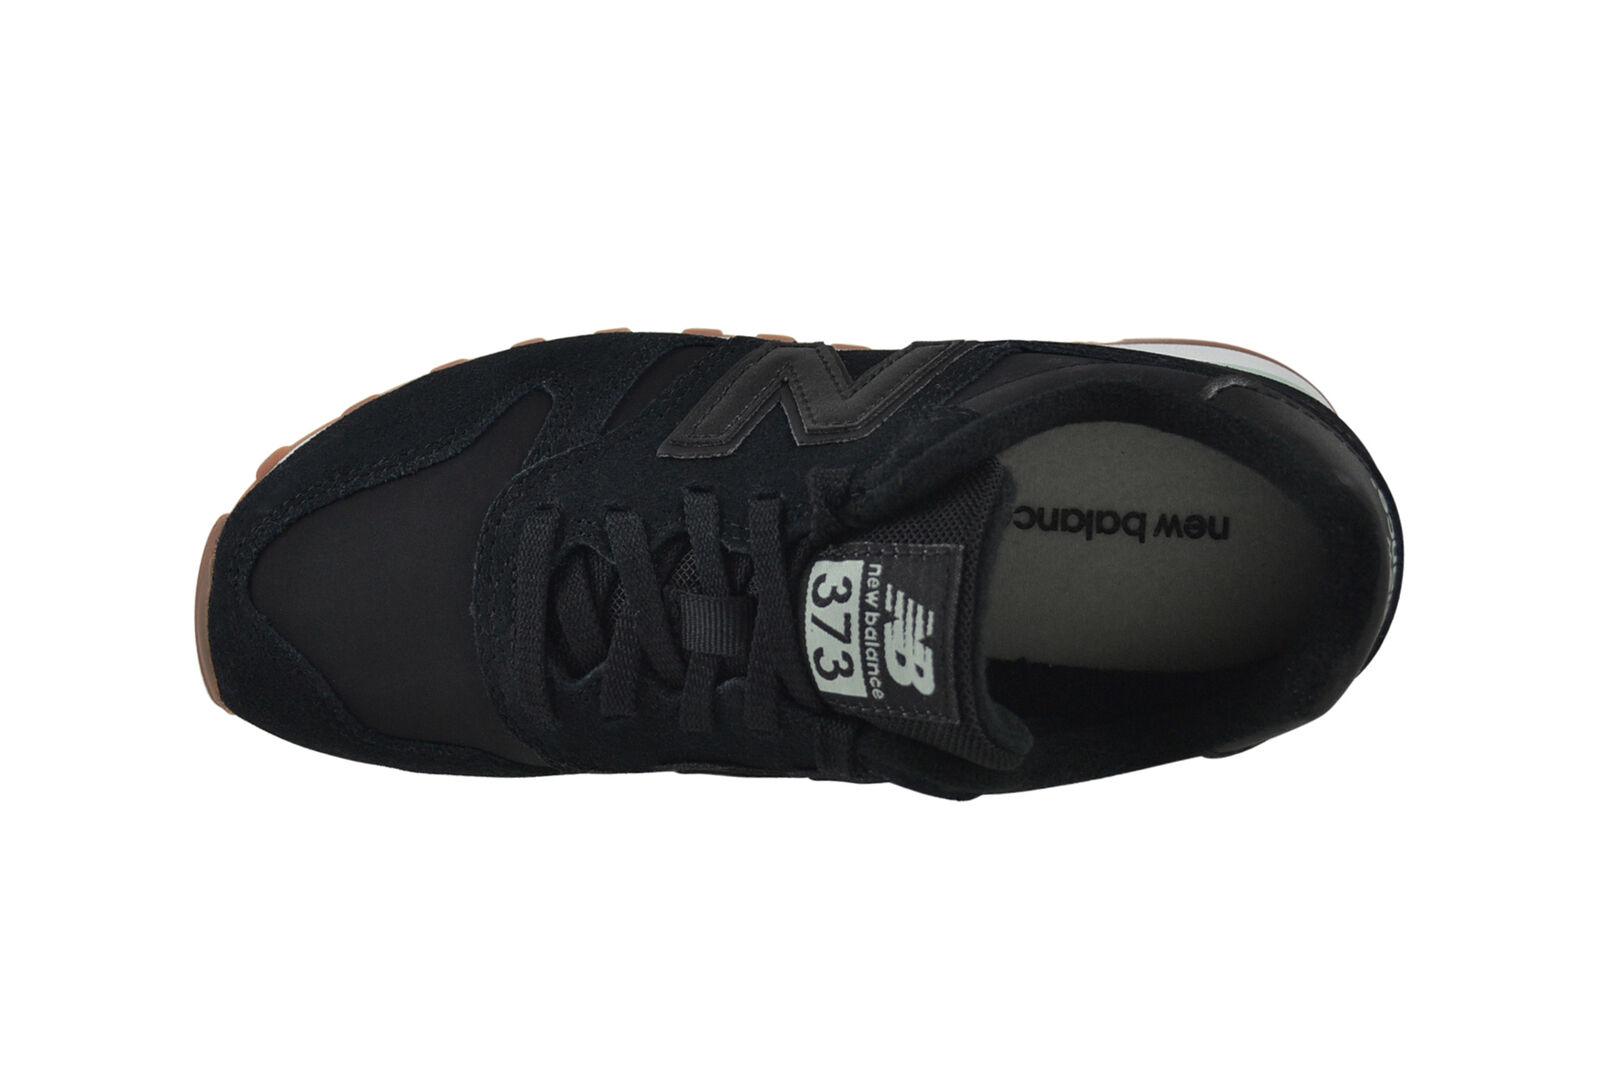 New Balance Sneaker WL373 KMS schwarz Schuhe Sneaker Balance schwarz 8c4aea